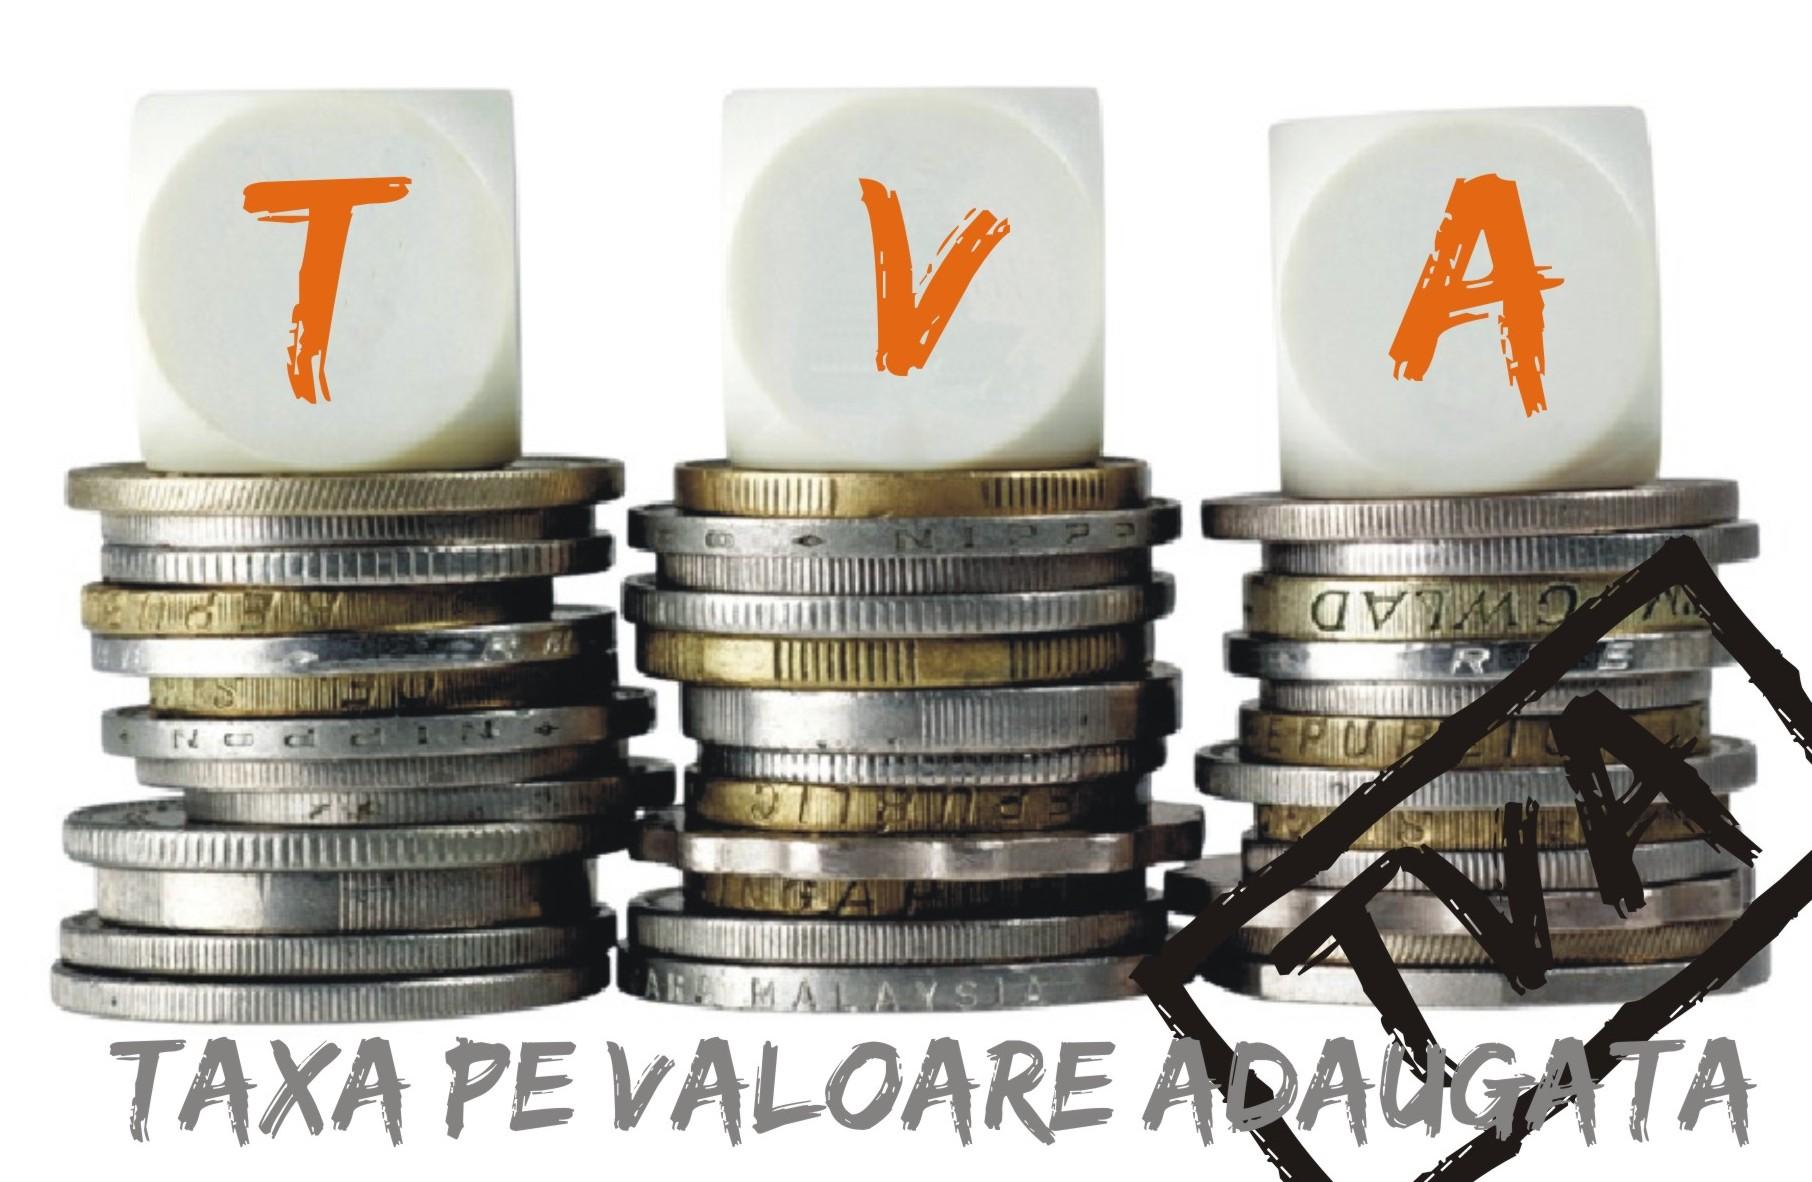 TVA-drept-deducere